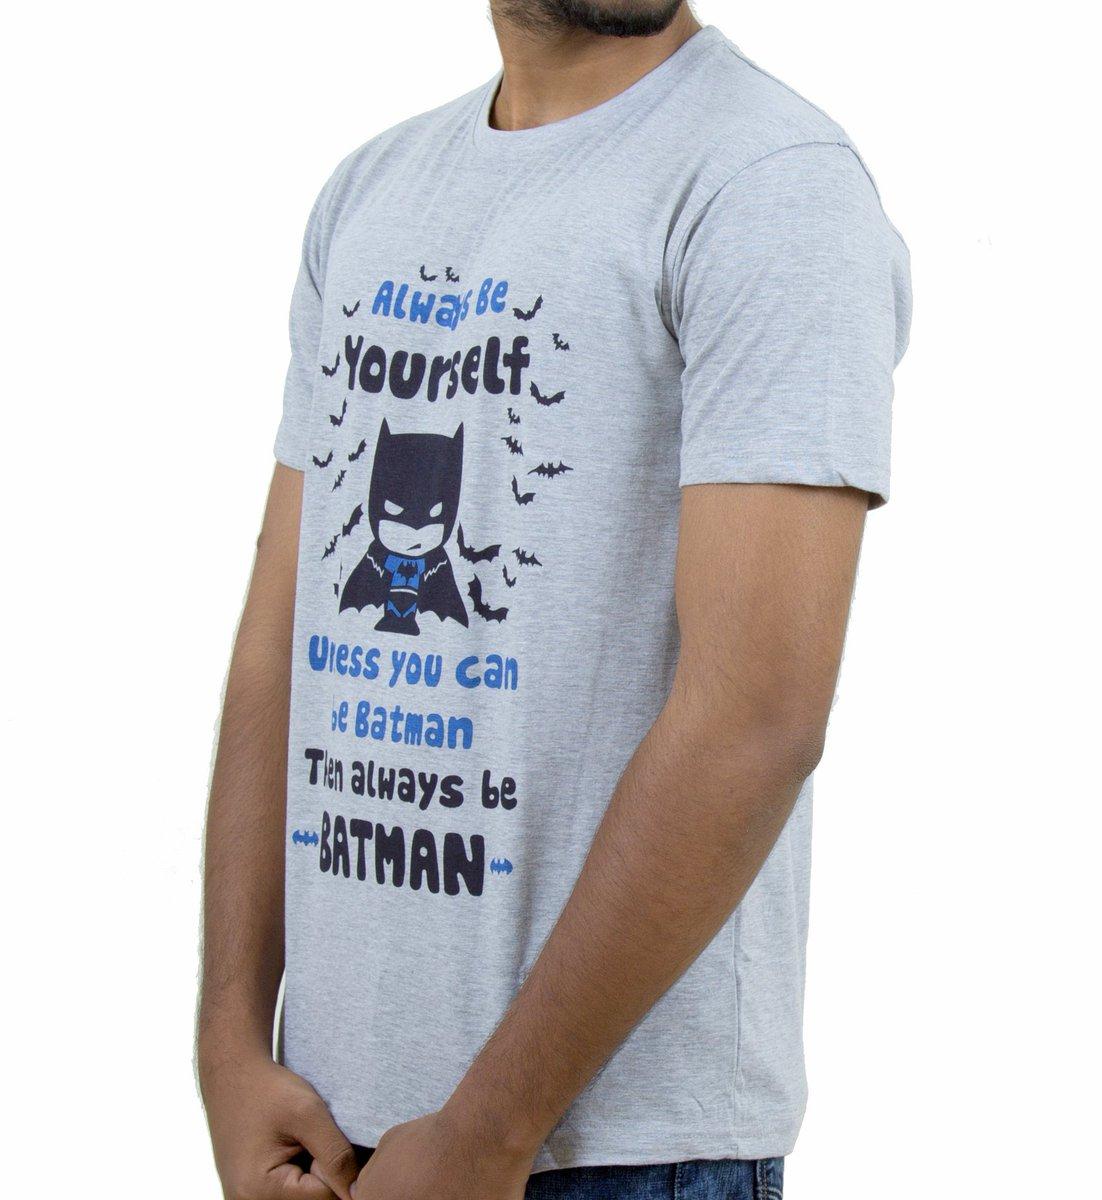 97ce1d5c BatmanTshirts tagged Tweets and Download Twitter MP4 Videos | Twitur